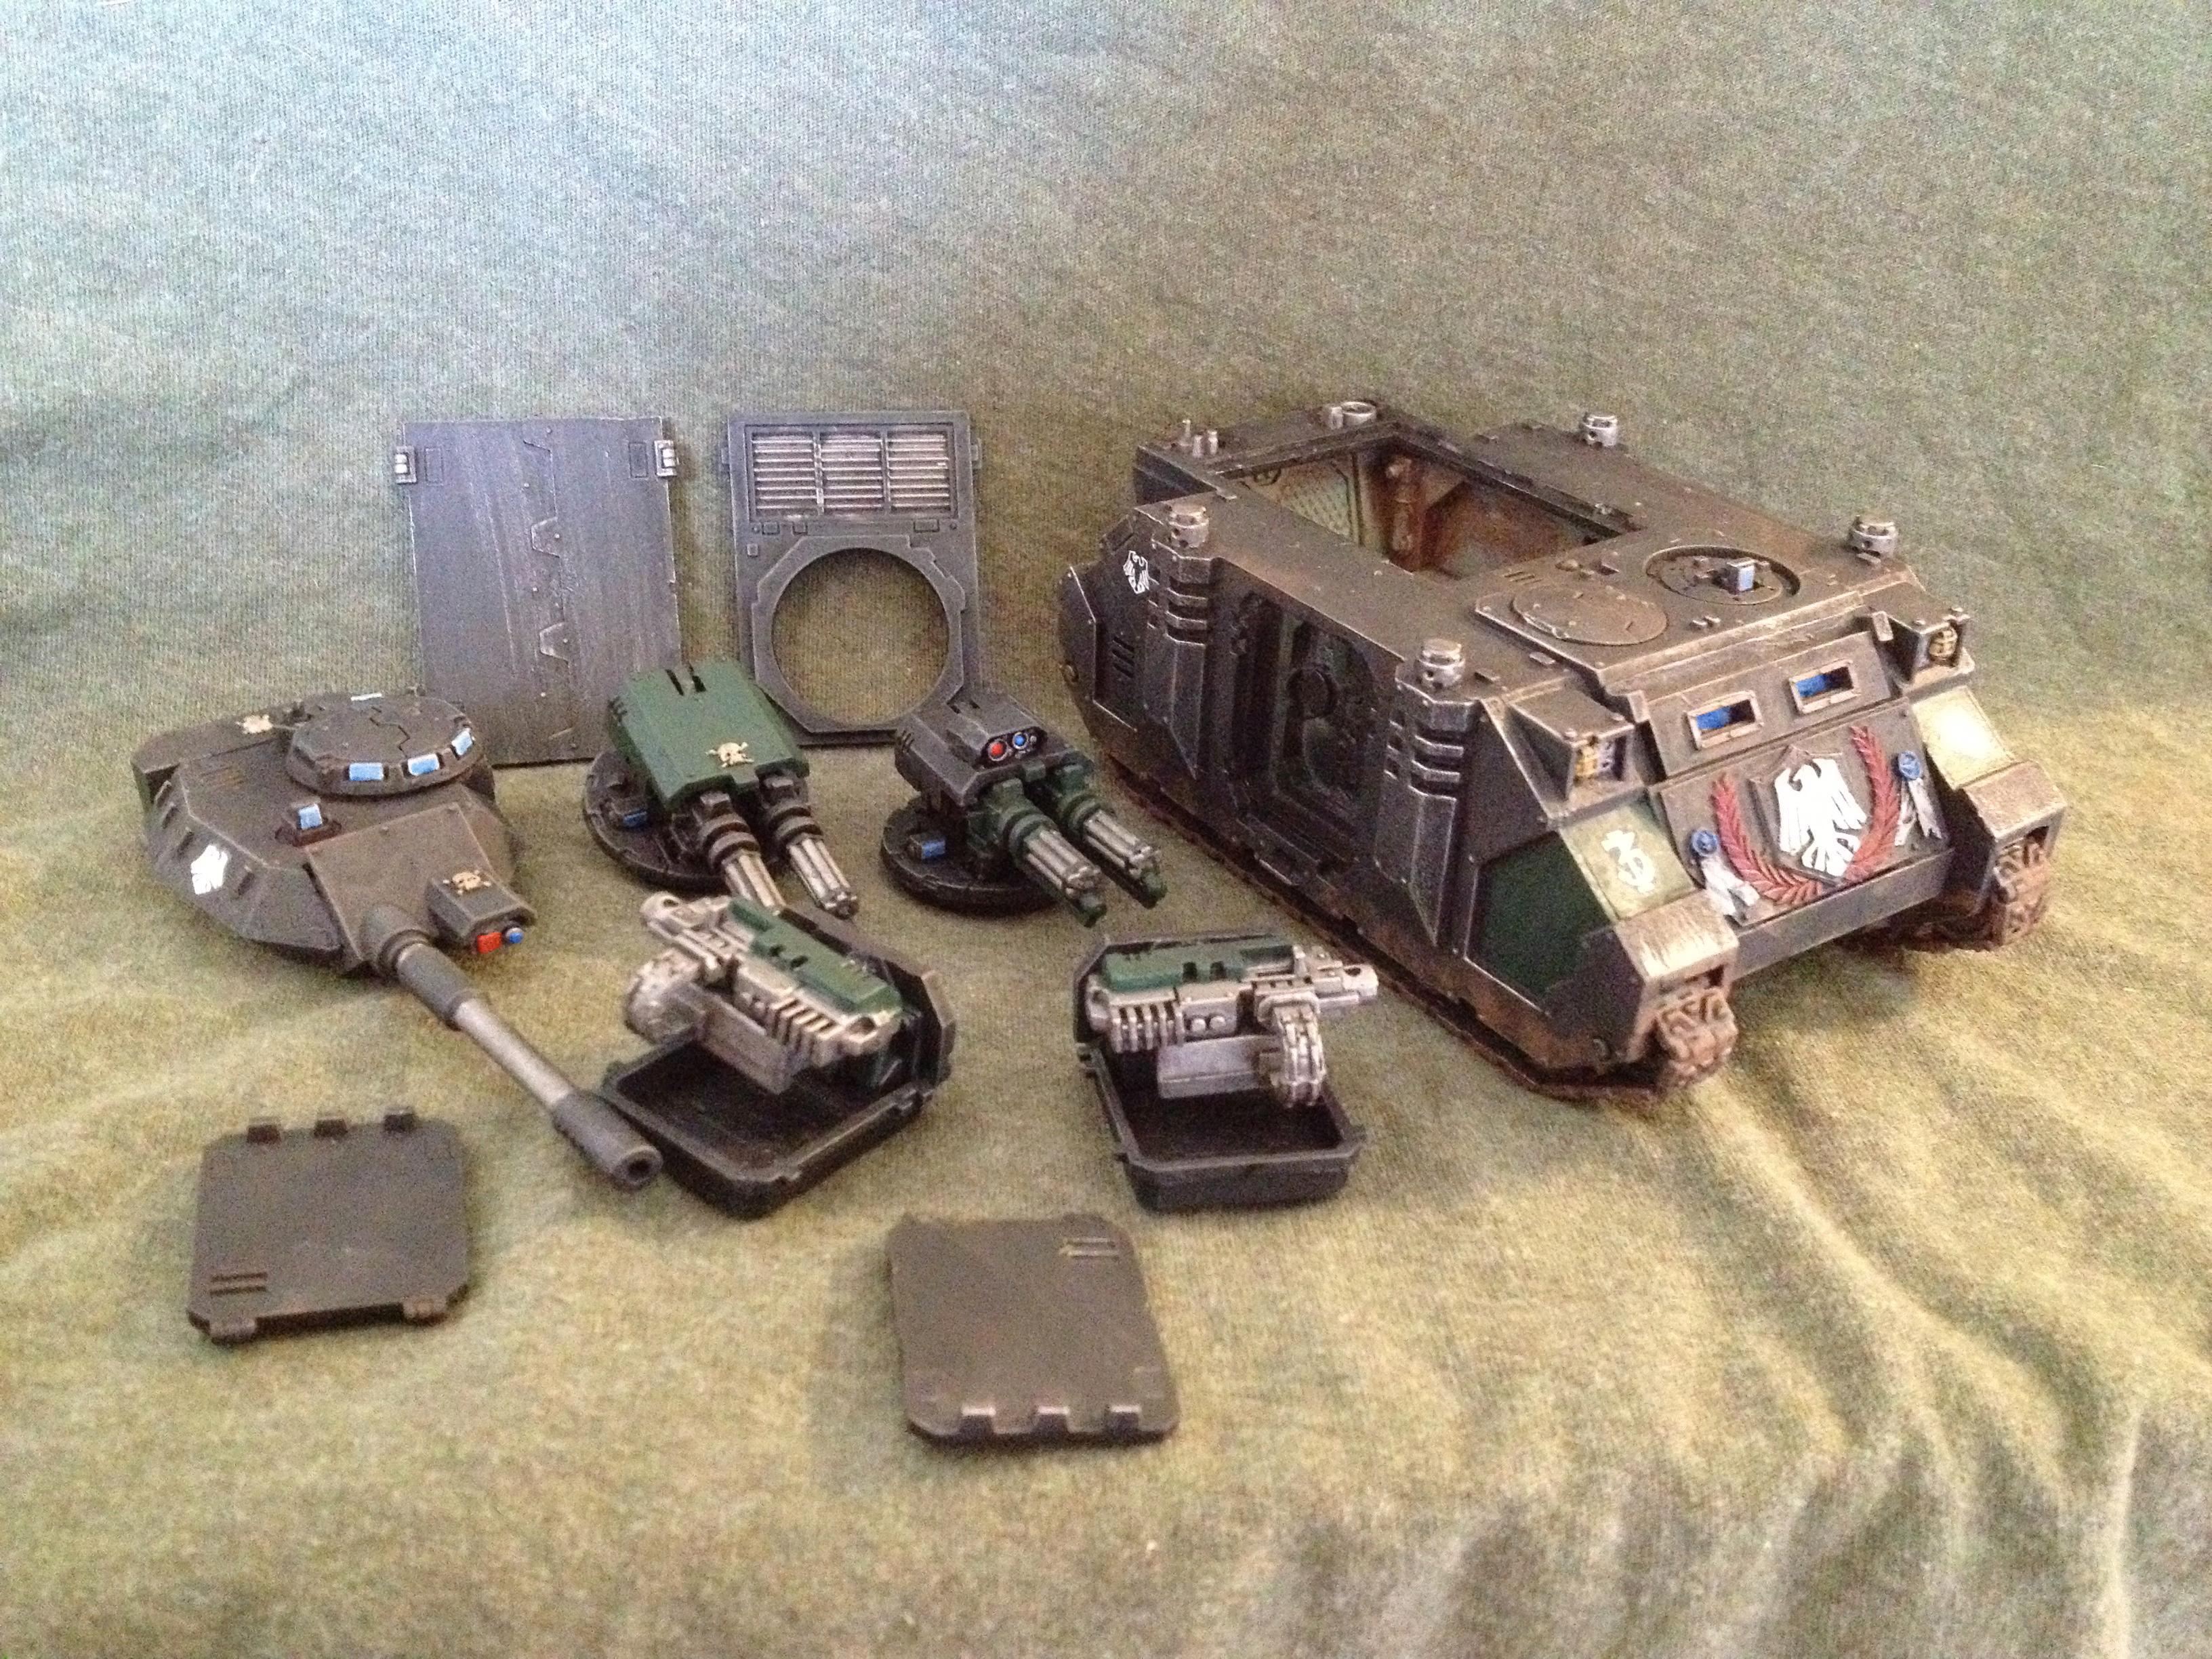 Magnetised, Predator, Raven Guard, Razorback, Rhino, Space Marines